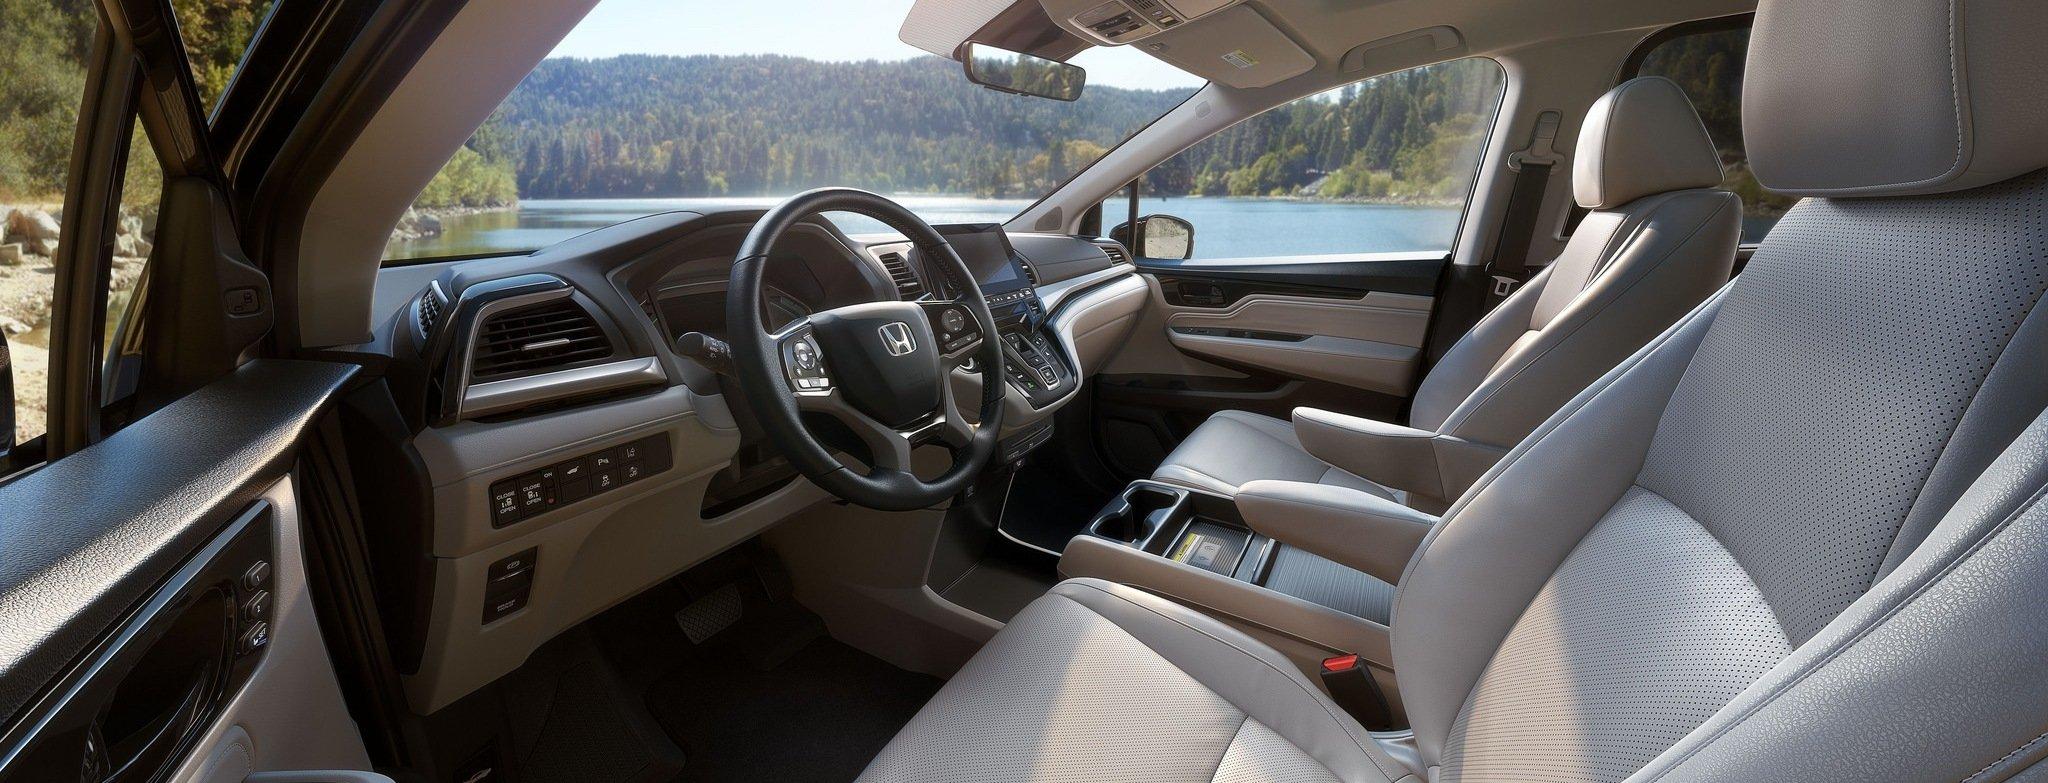 2018 Honda Odyssey front interior - Milwaukee, WI